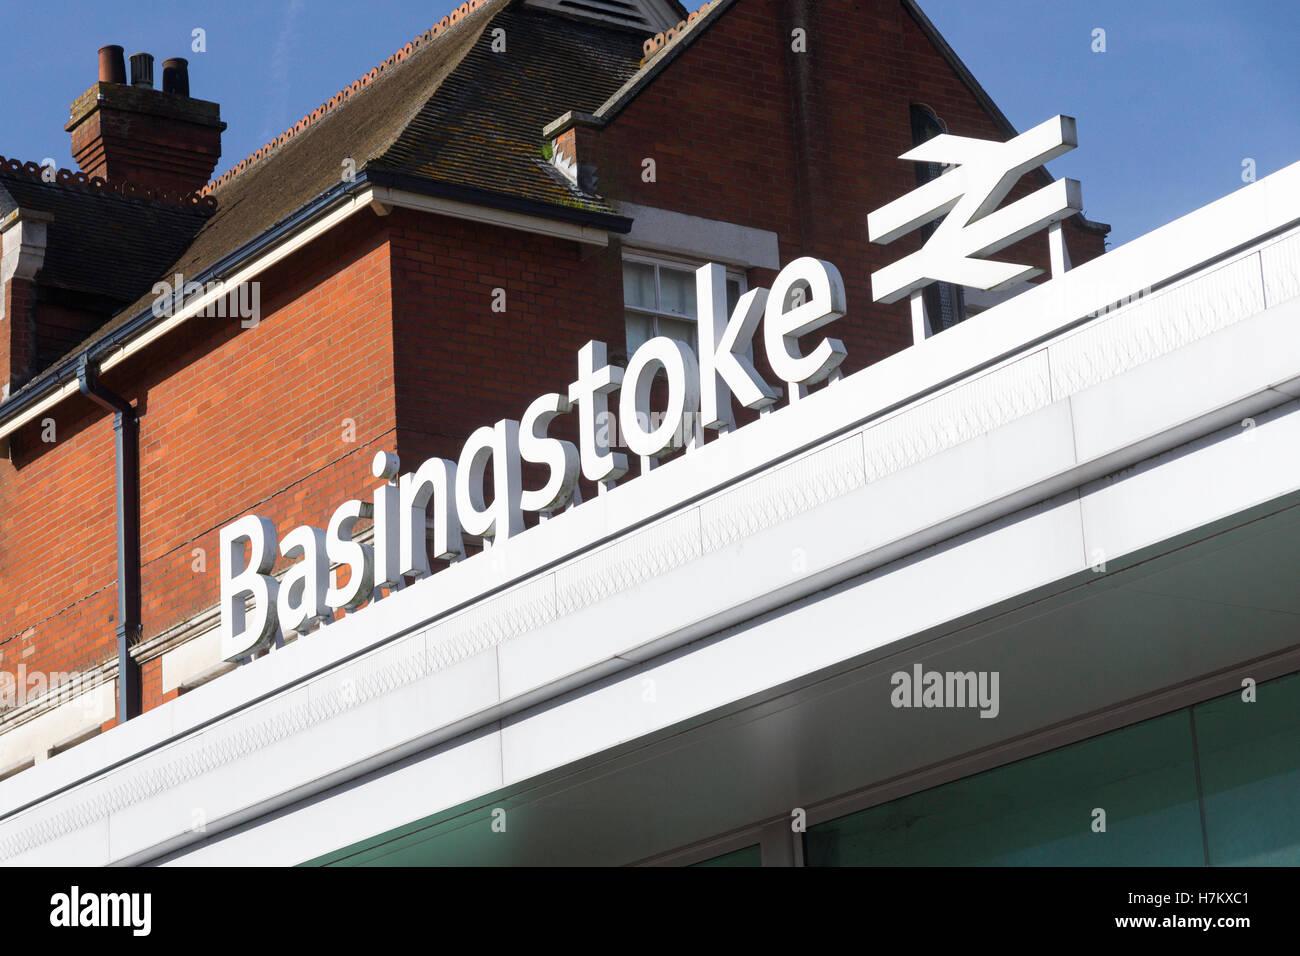 basingstoke-railway-station-hampshire-H7